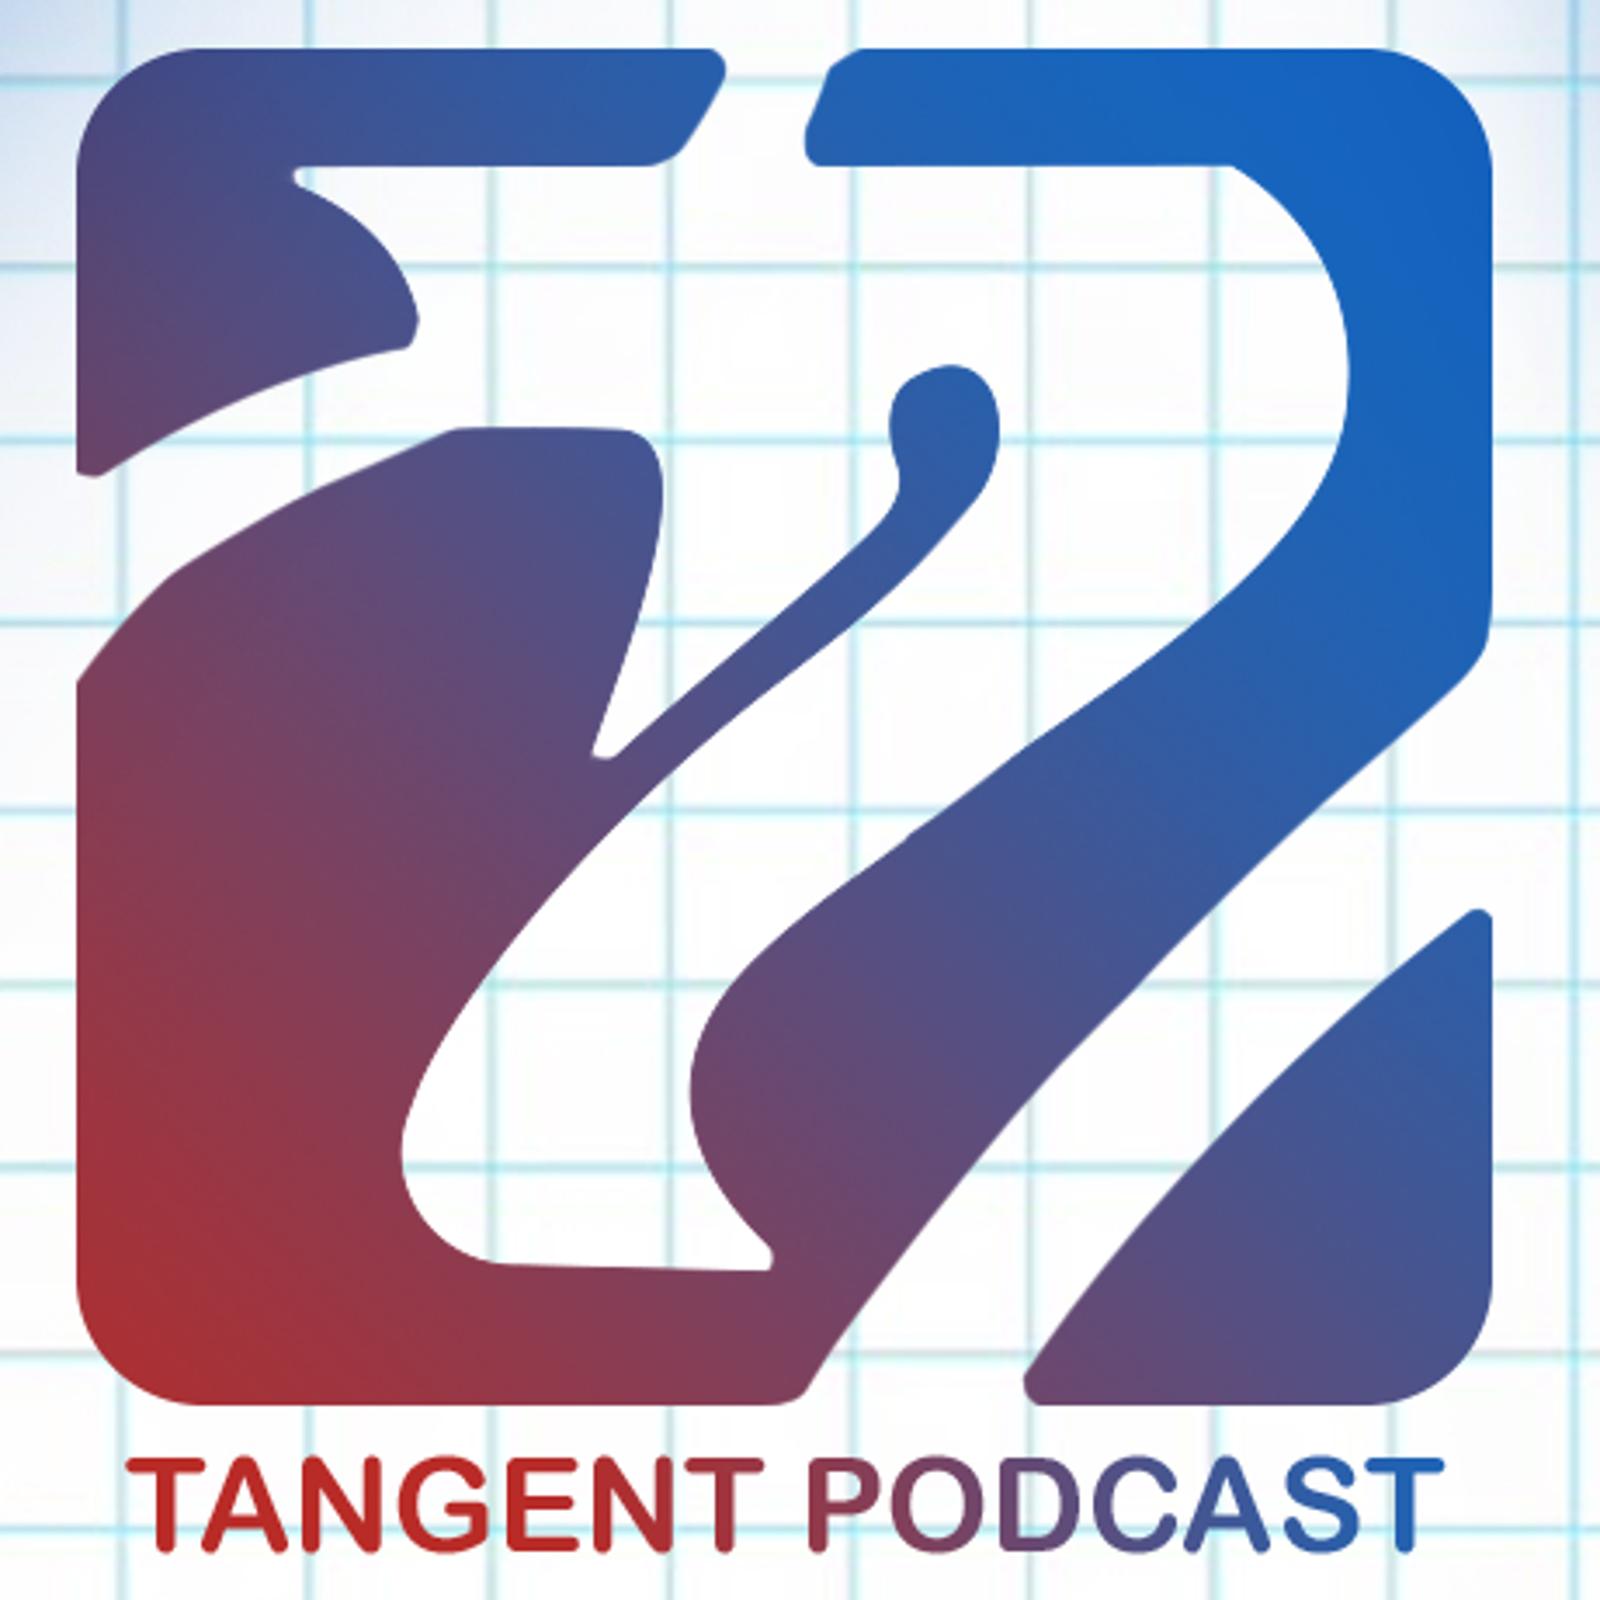 Tangent Podcast show art